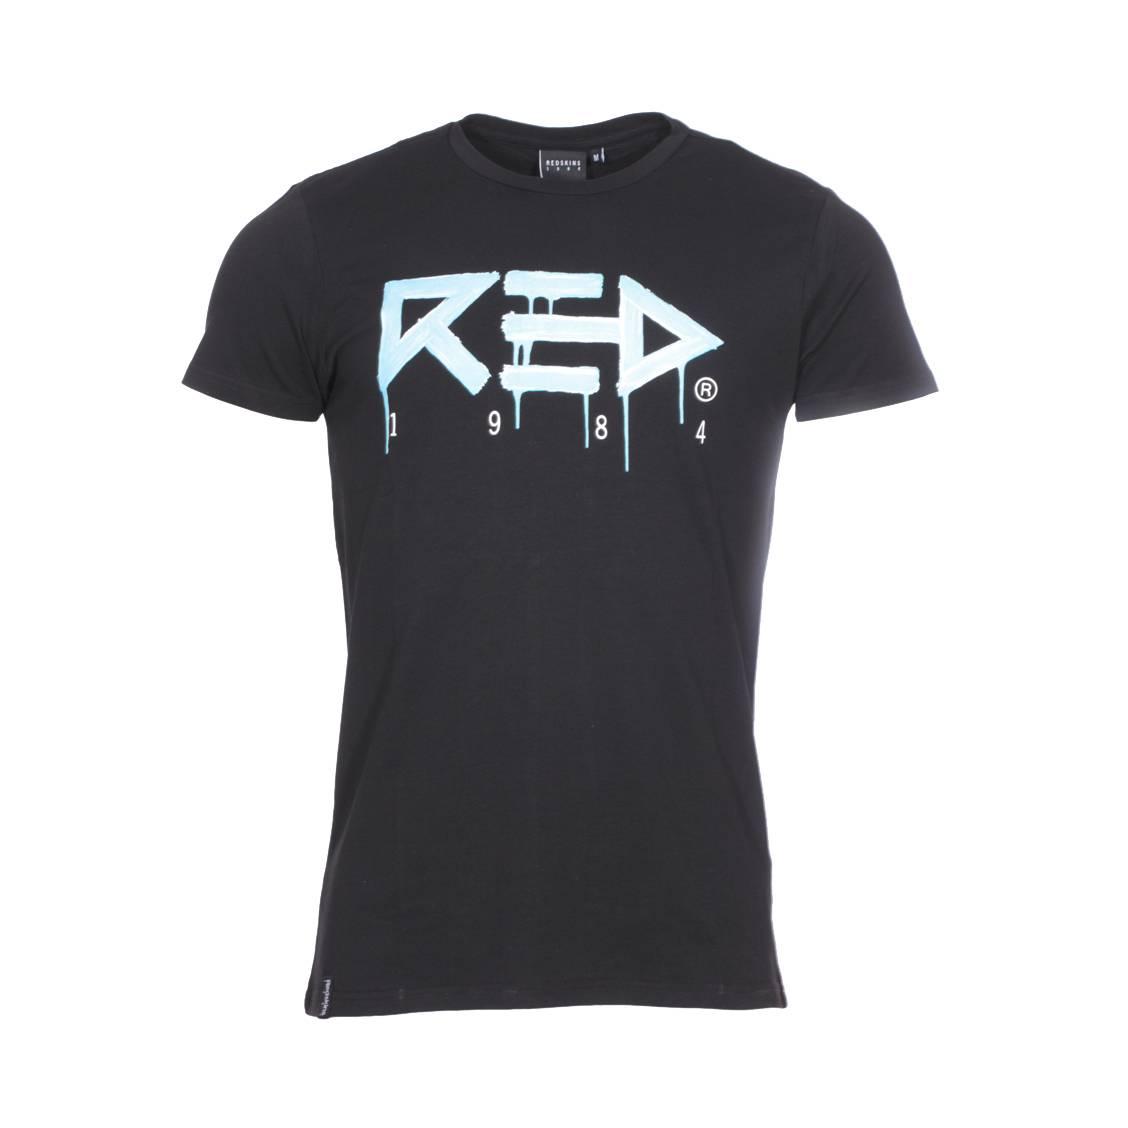 Tee-shirt col rond  undefeated en coton stretch noir floqué en bleu